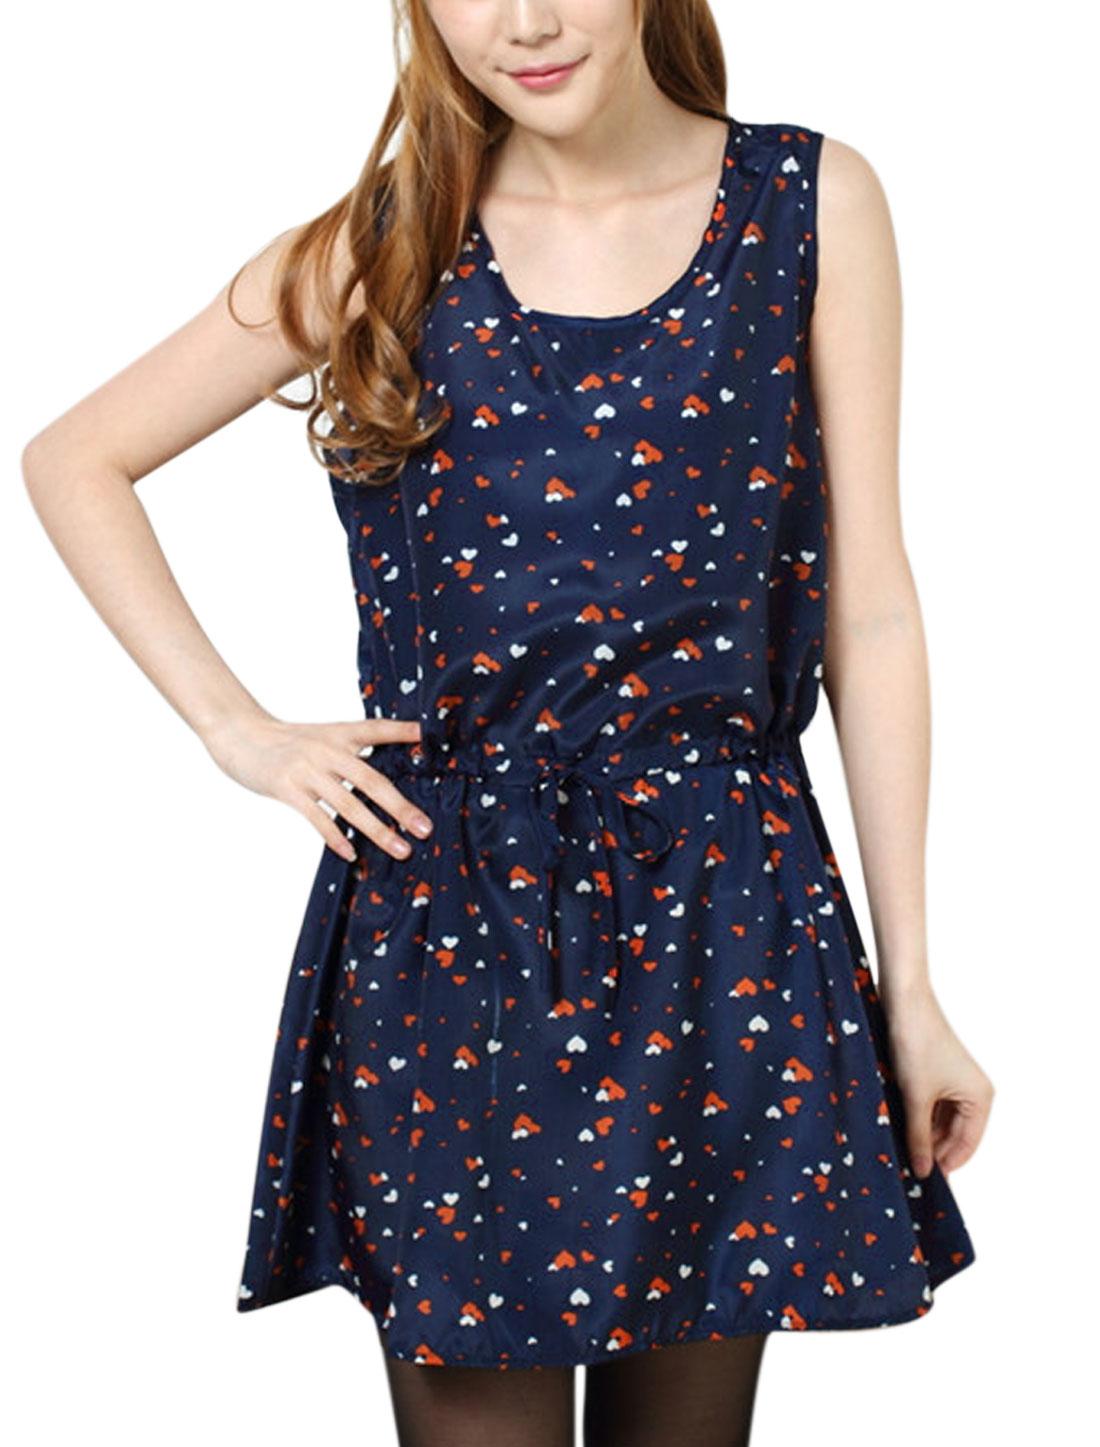 Women Sleeveless Hearts Pattern Drawstring Sweet Tank Dress Navy Blue XS